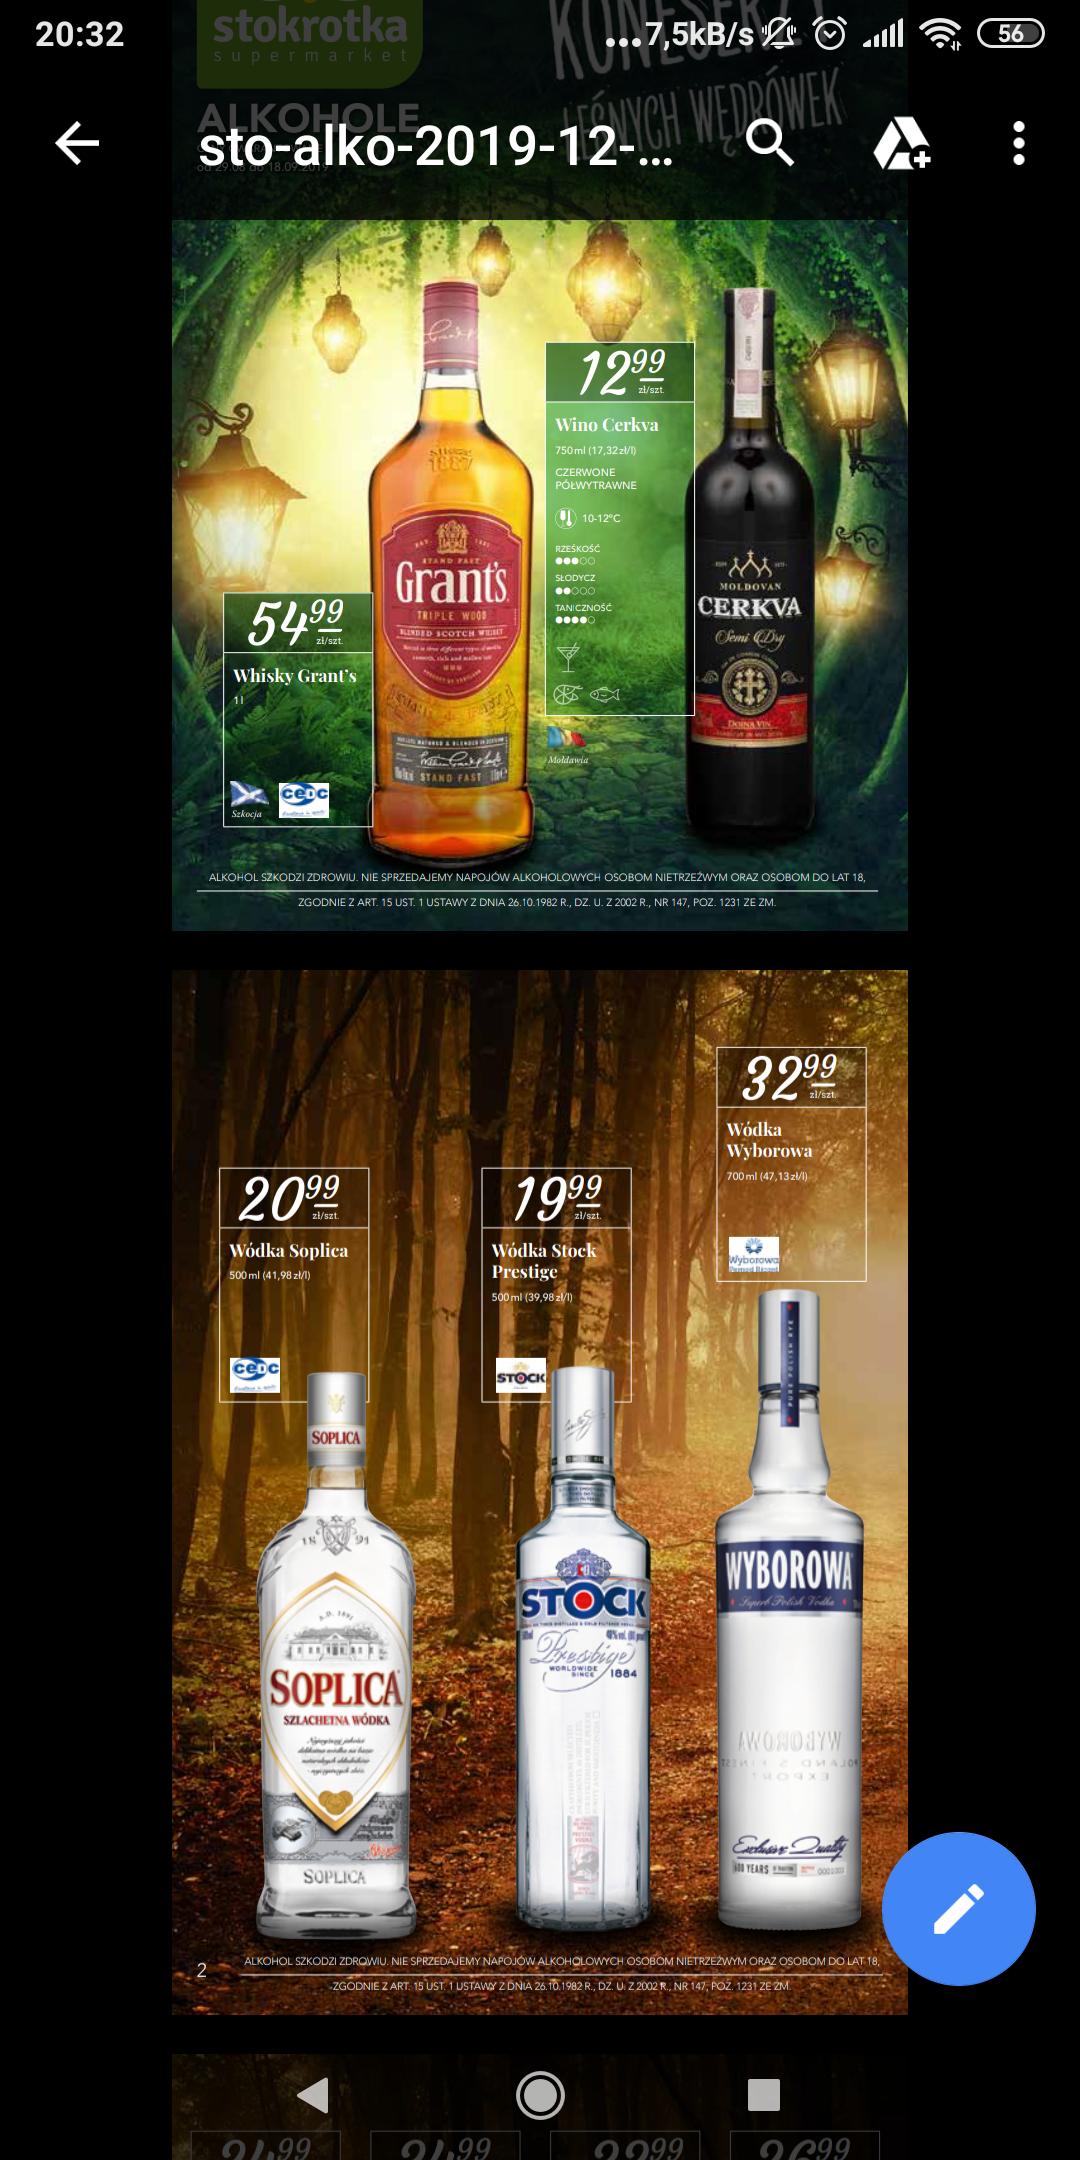 Stokrotka: whisky Grant's 1 l za 55 zł; wódka 0,5 l Stock 20 zł